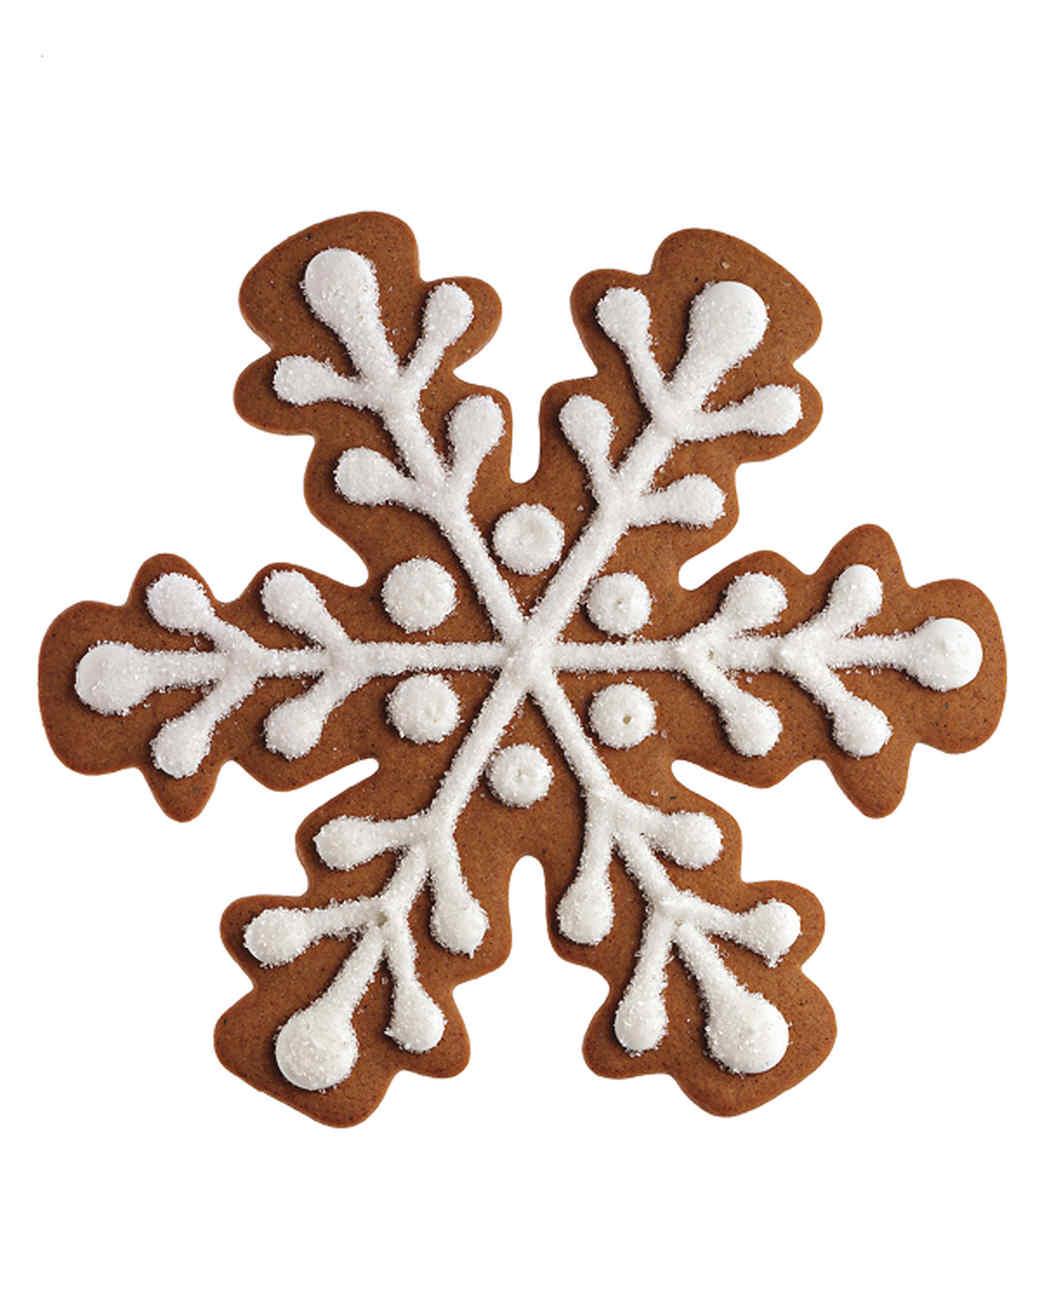 Gingerbread Cookies Images Free Download Best Gingerbread Cookies